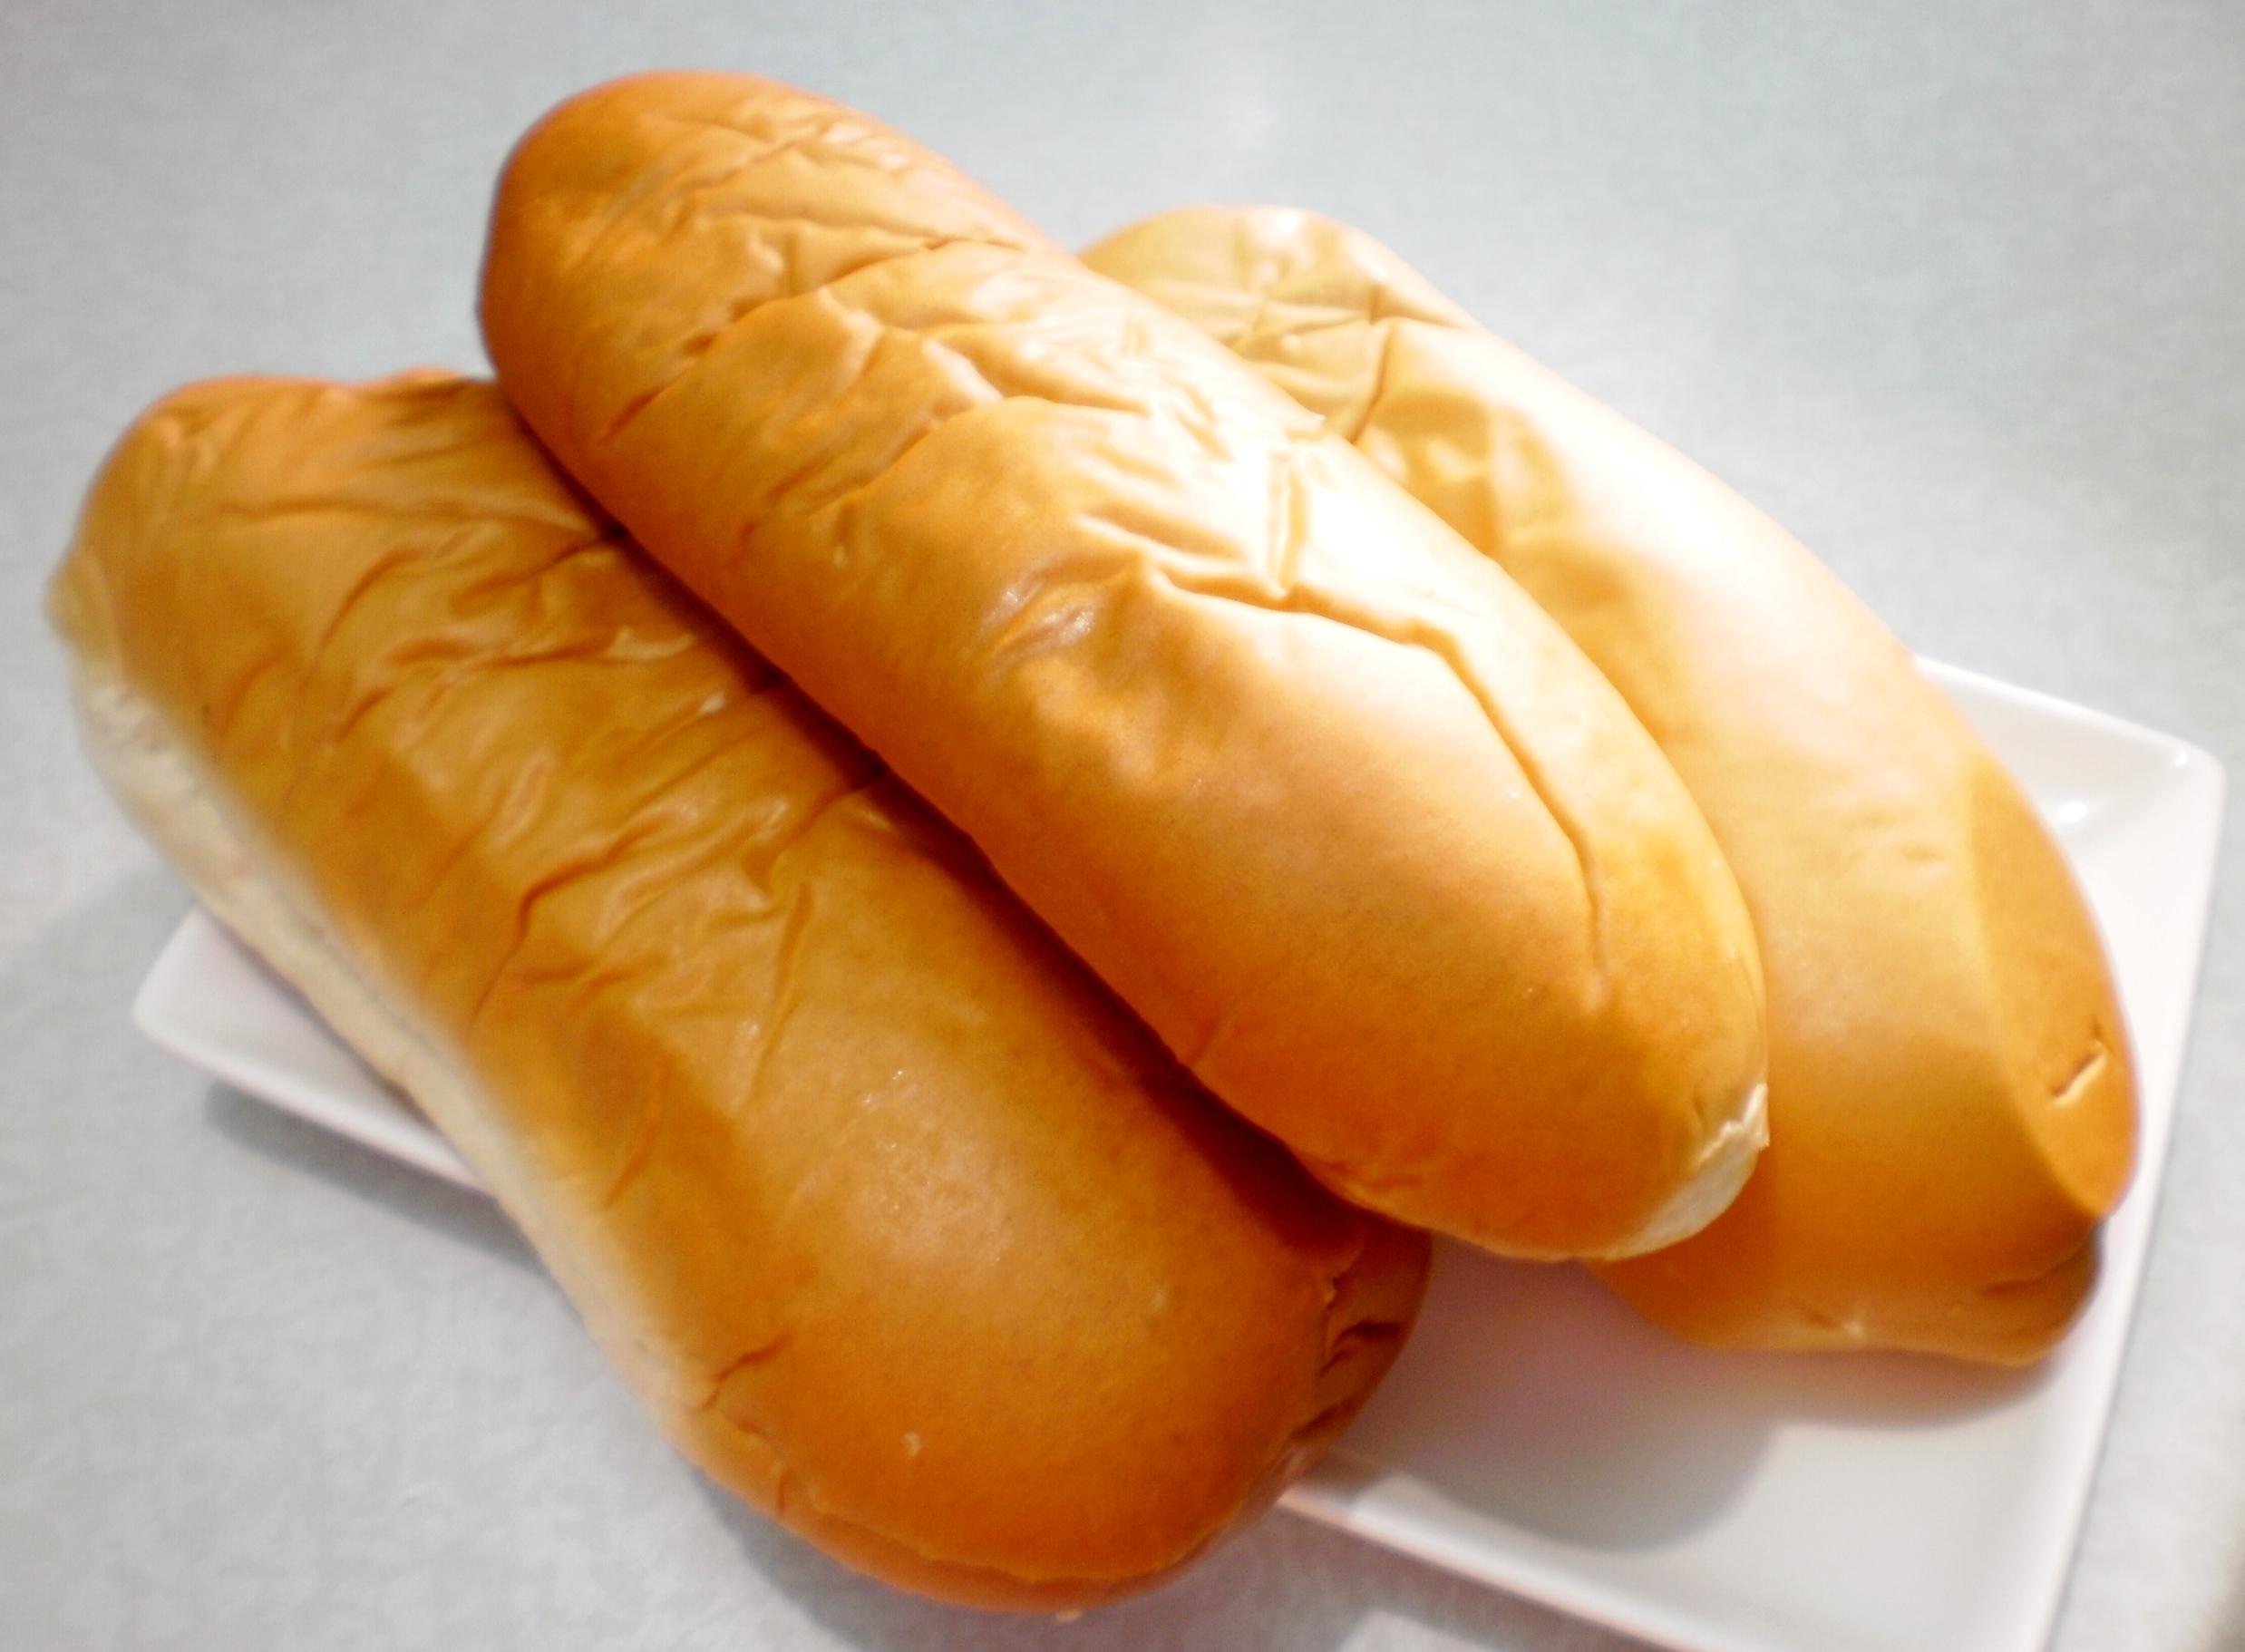 Hot Dog Buns Top Slice